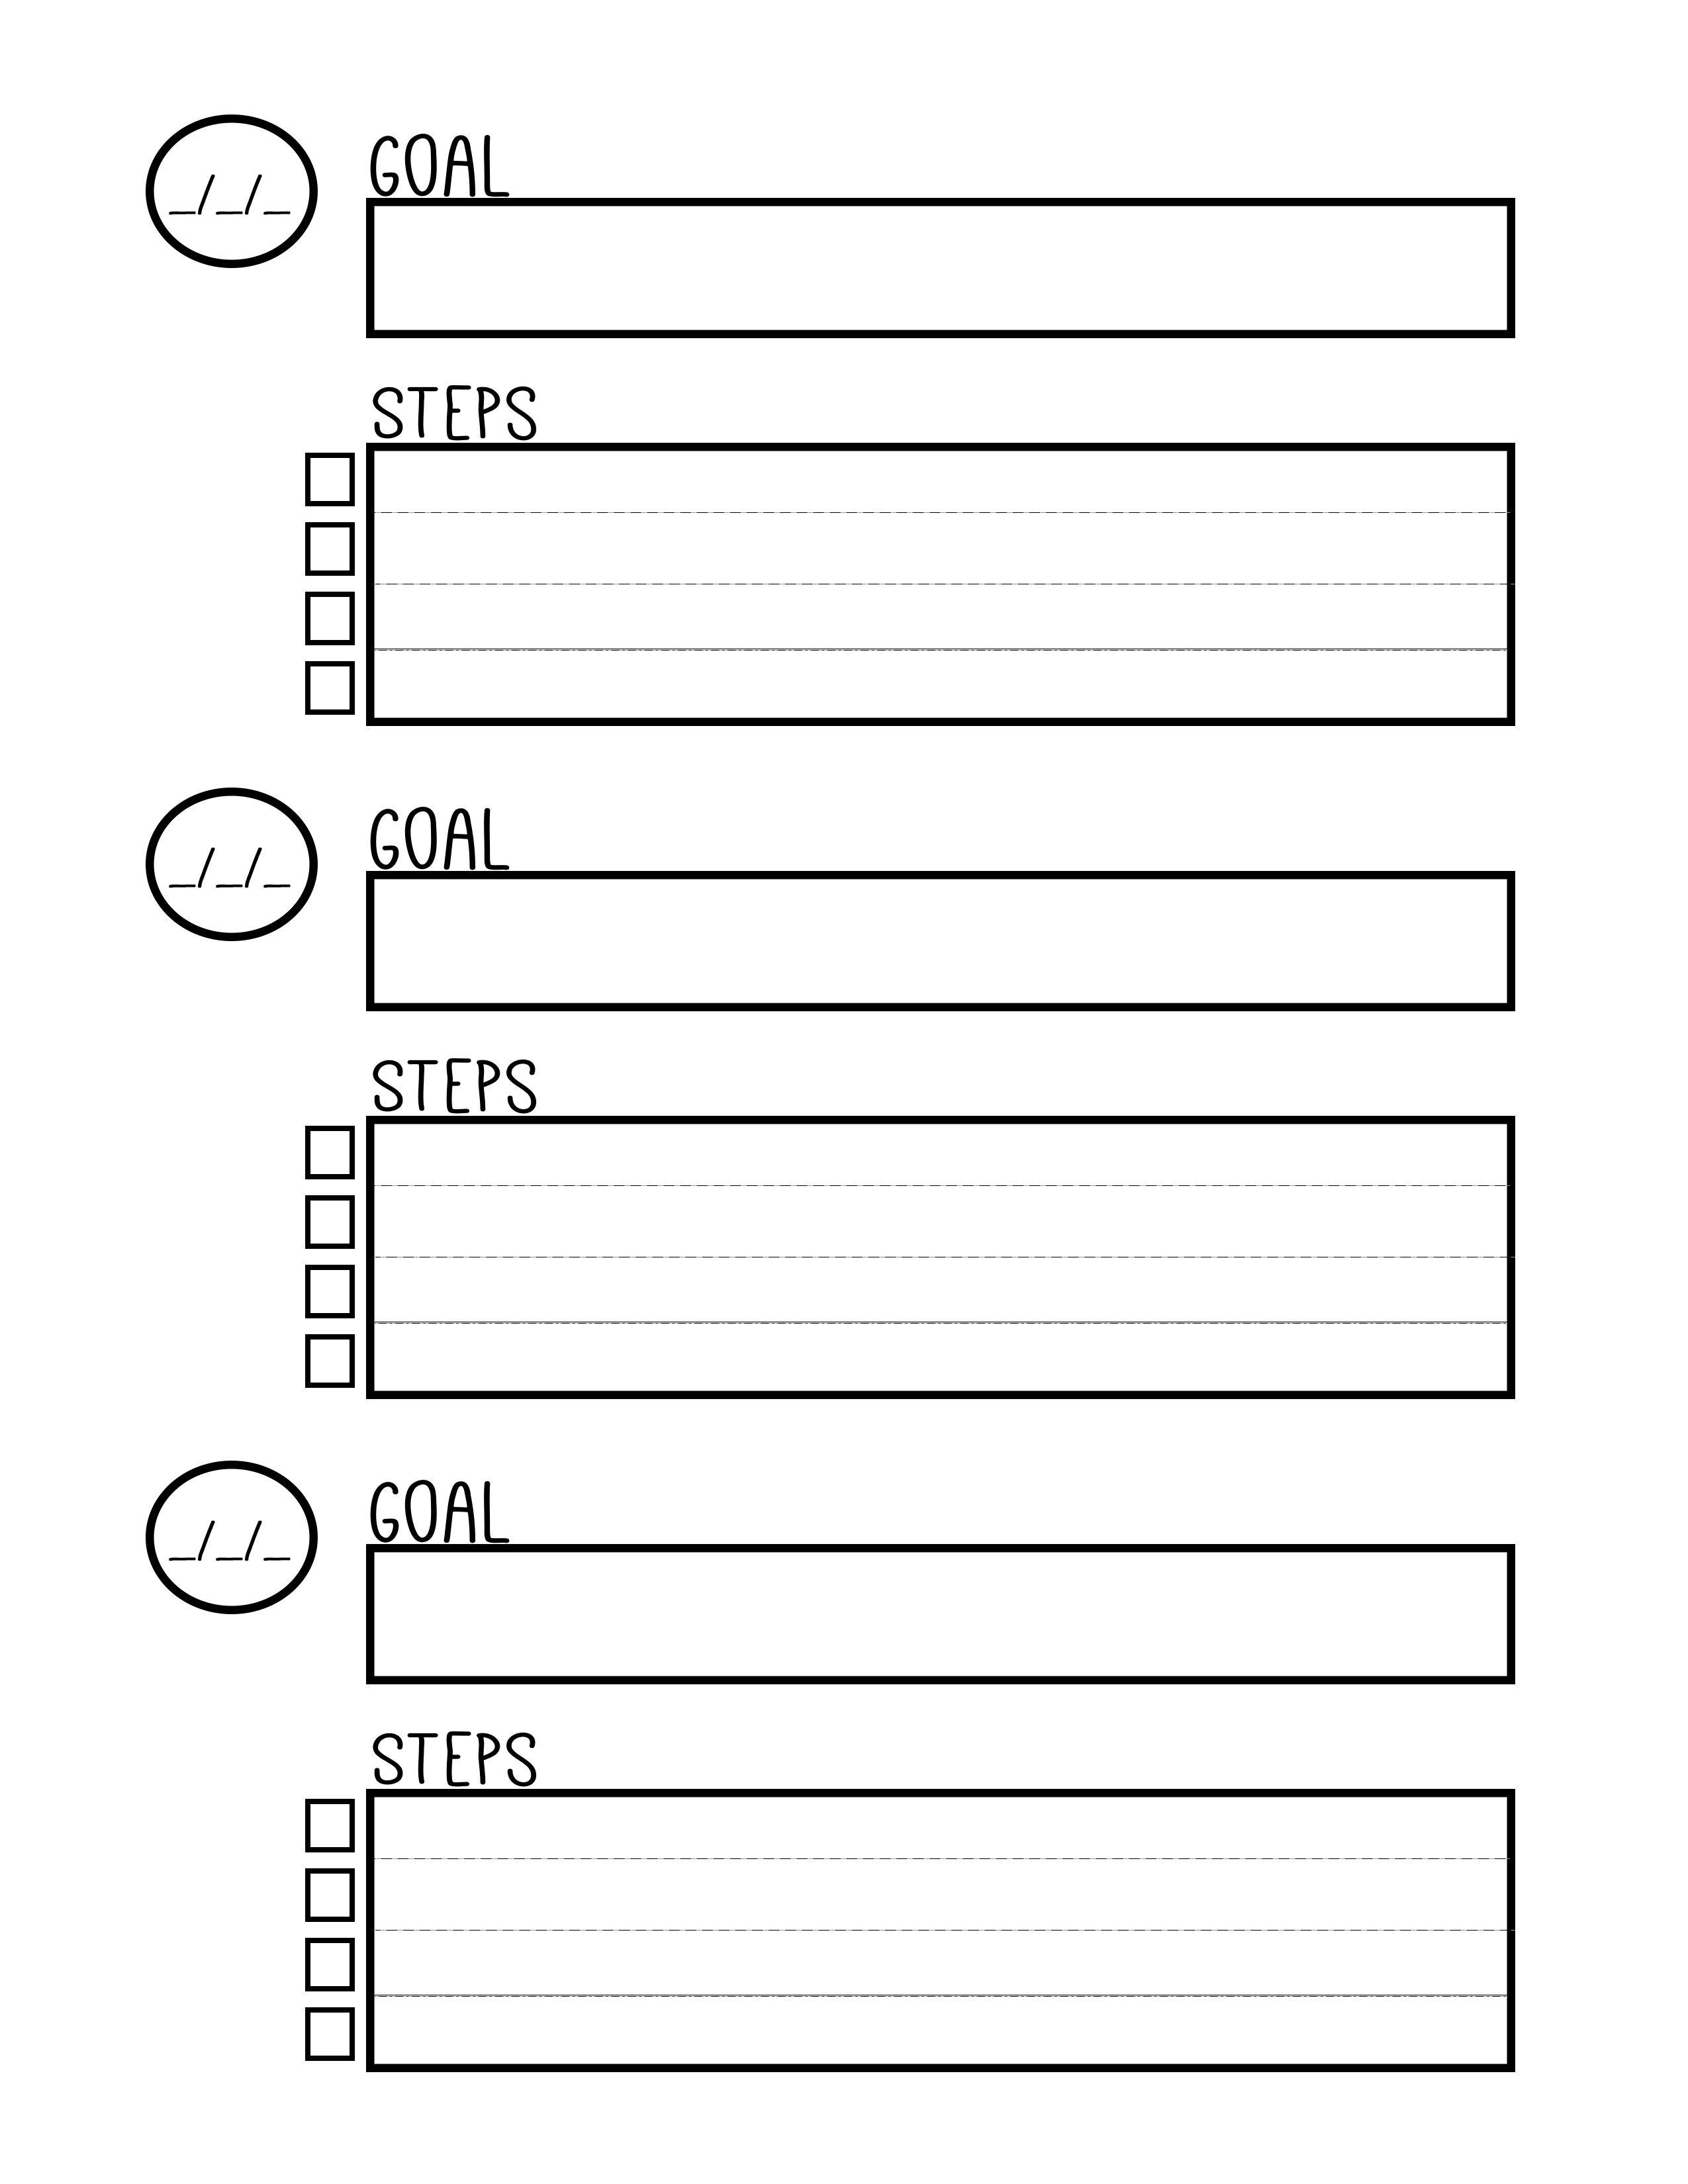 Free Printable Goal Setting Worksheet - Planner … | Education | Goal - Free Printable Goal Setting Worksheets For Students